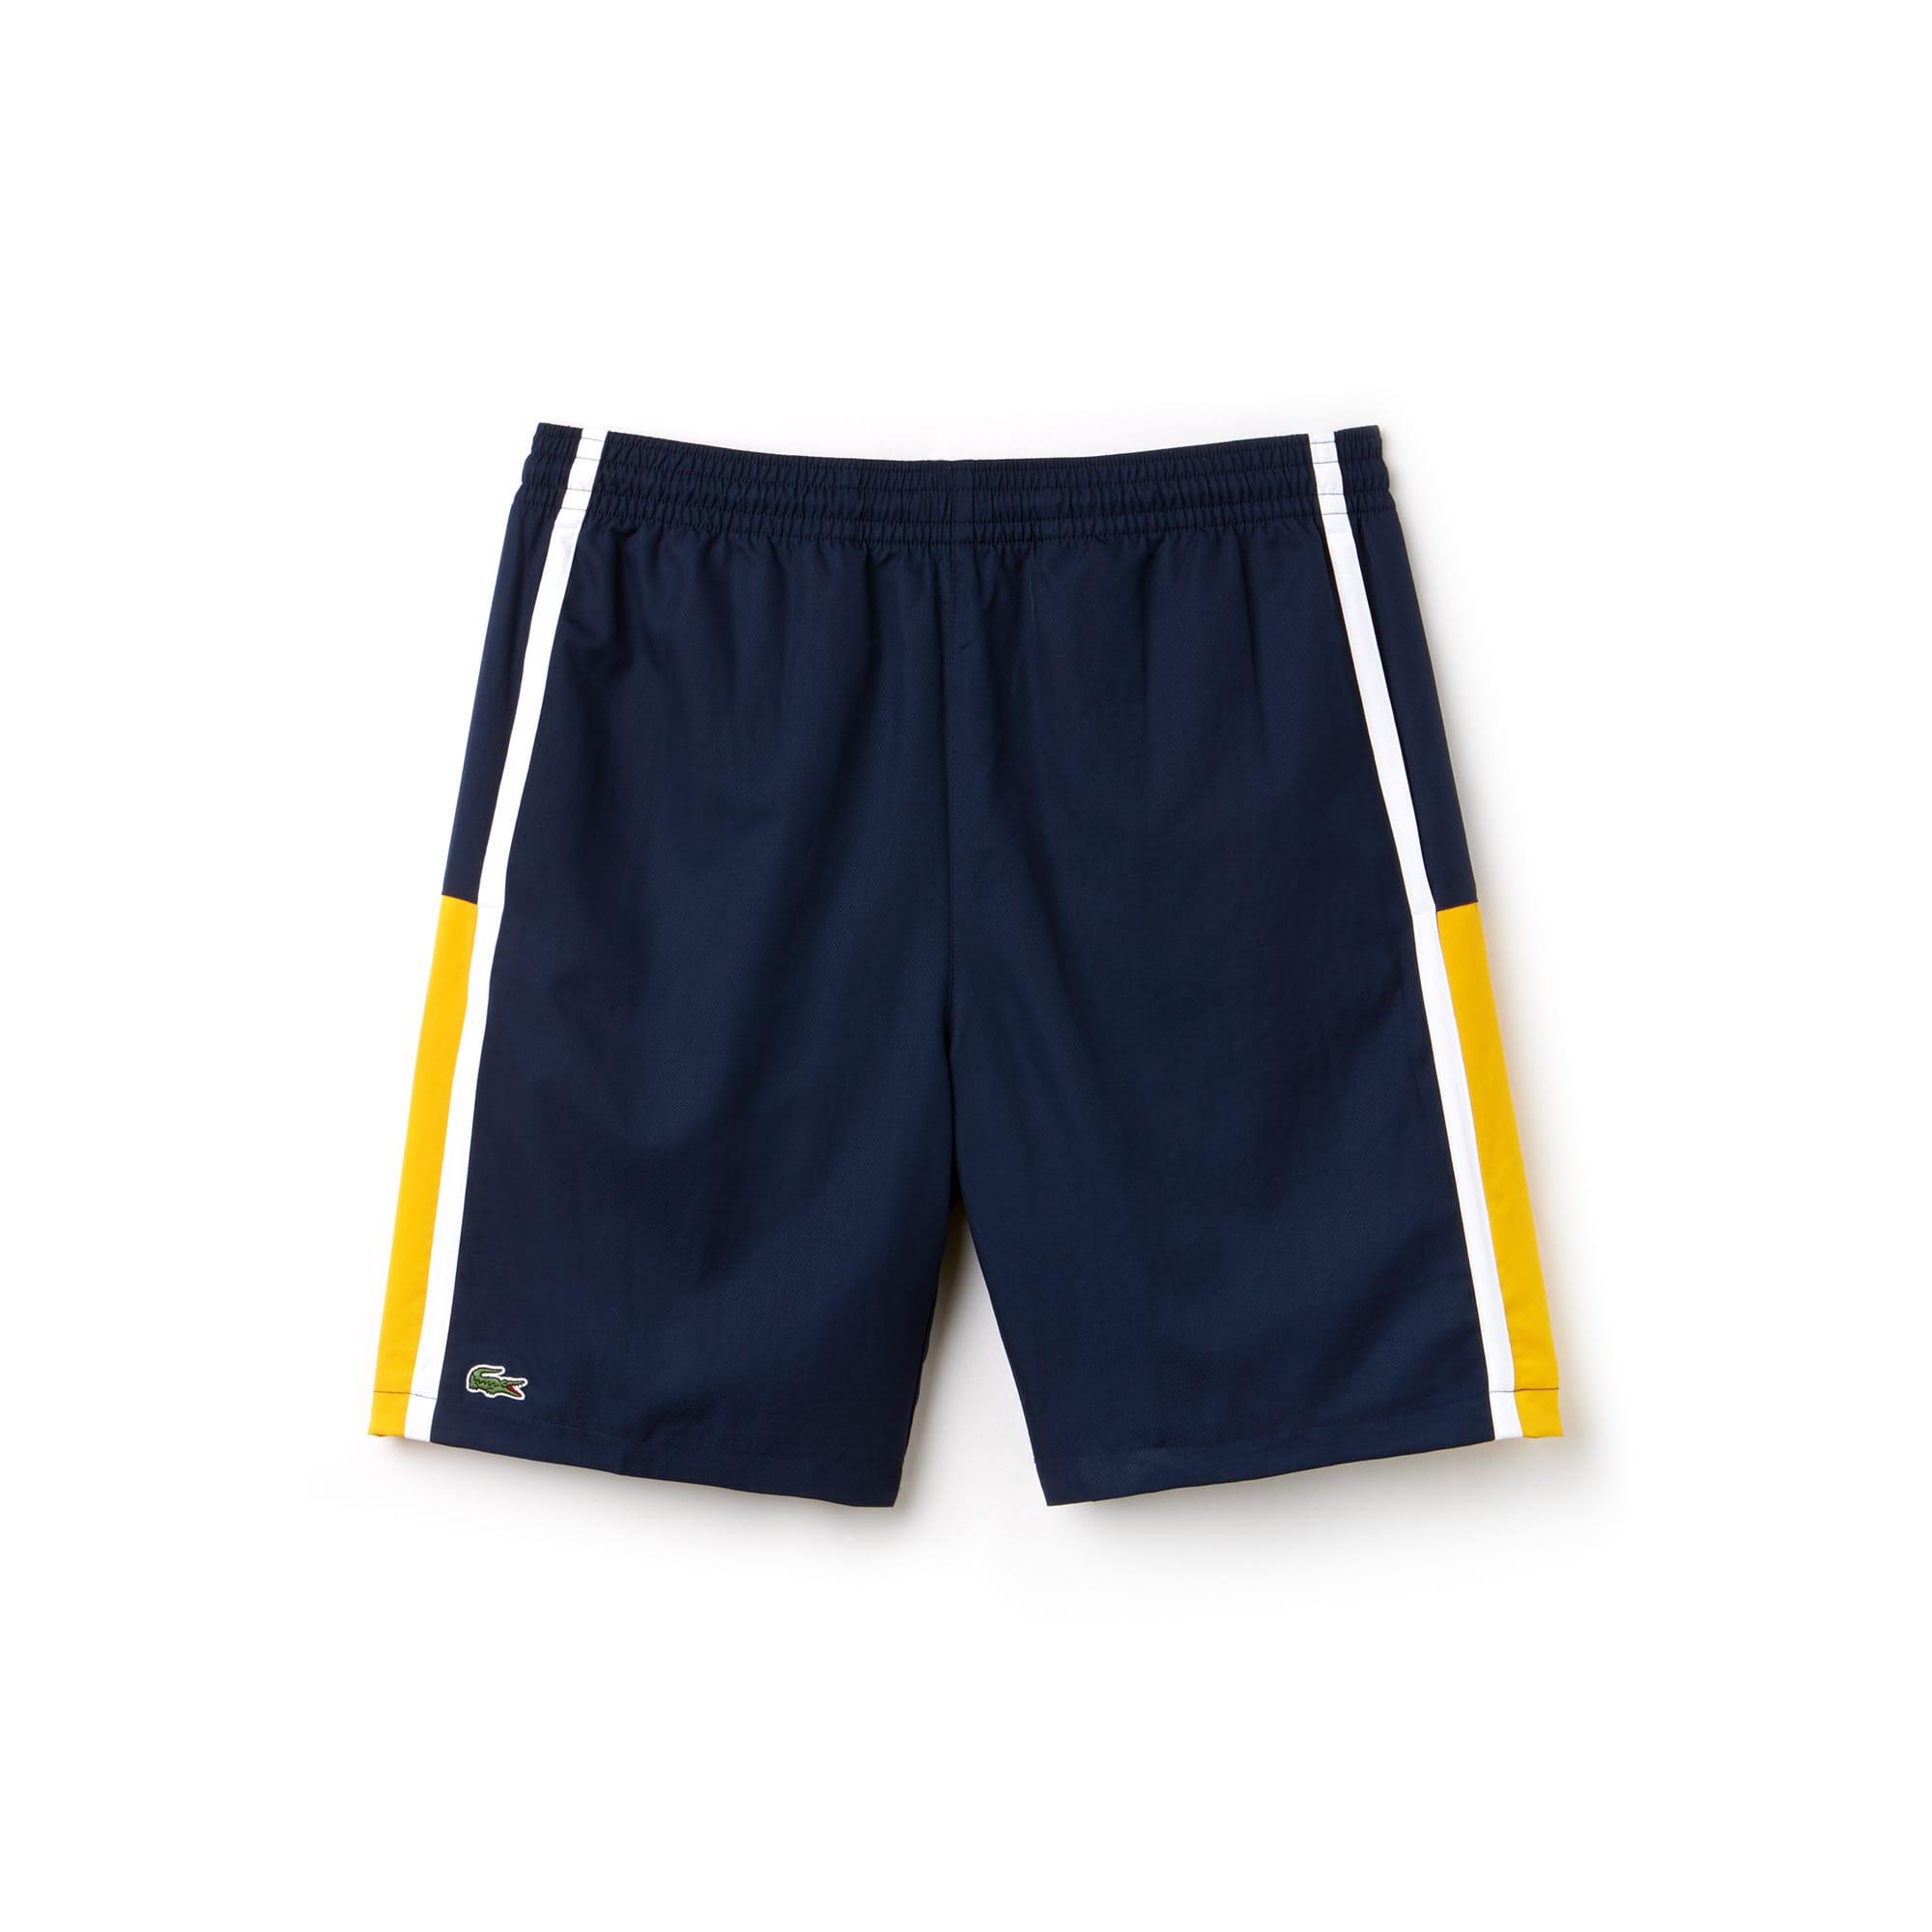 Men's SPORT Taffeta Tennis Shorts